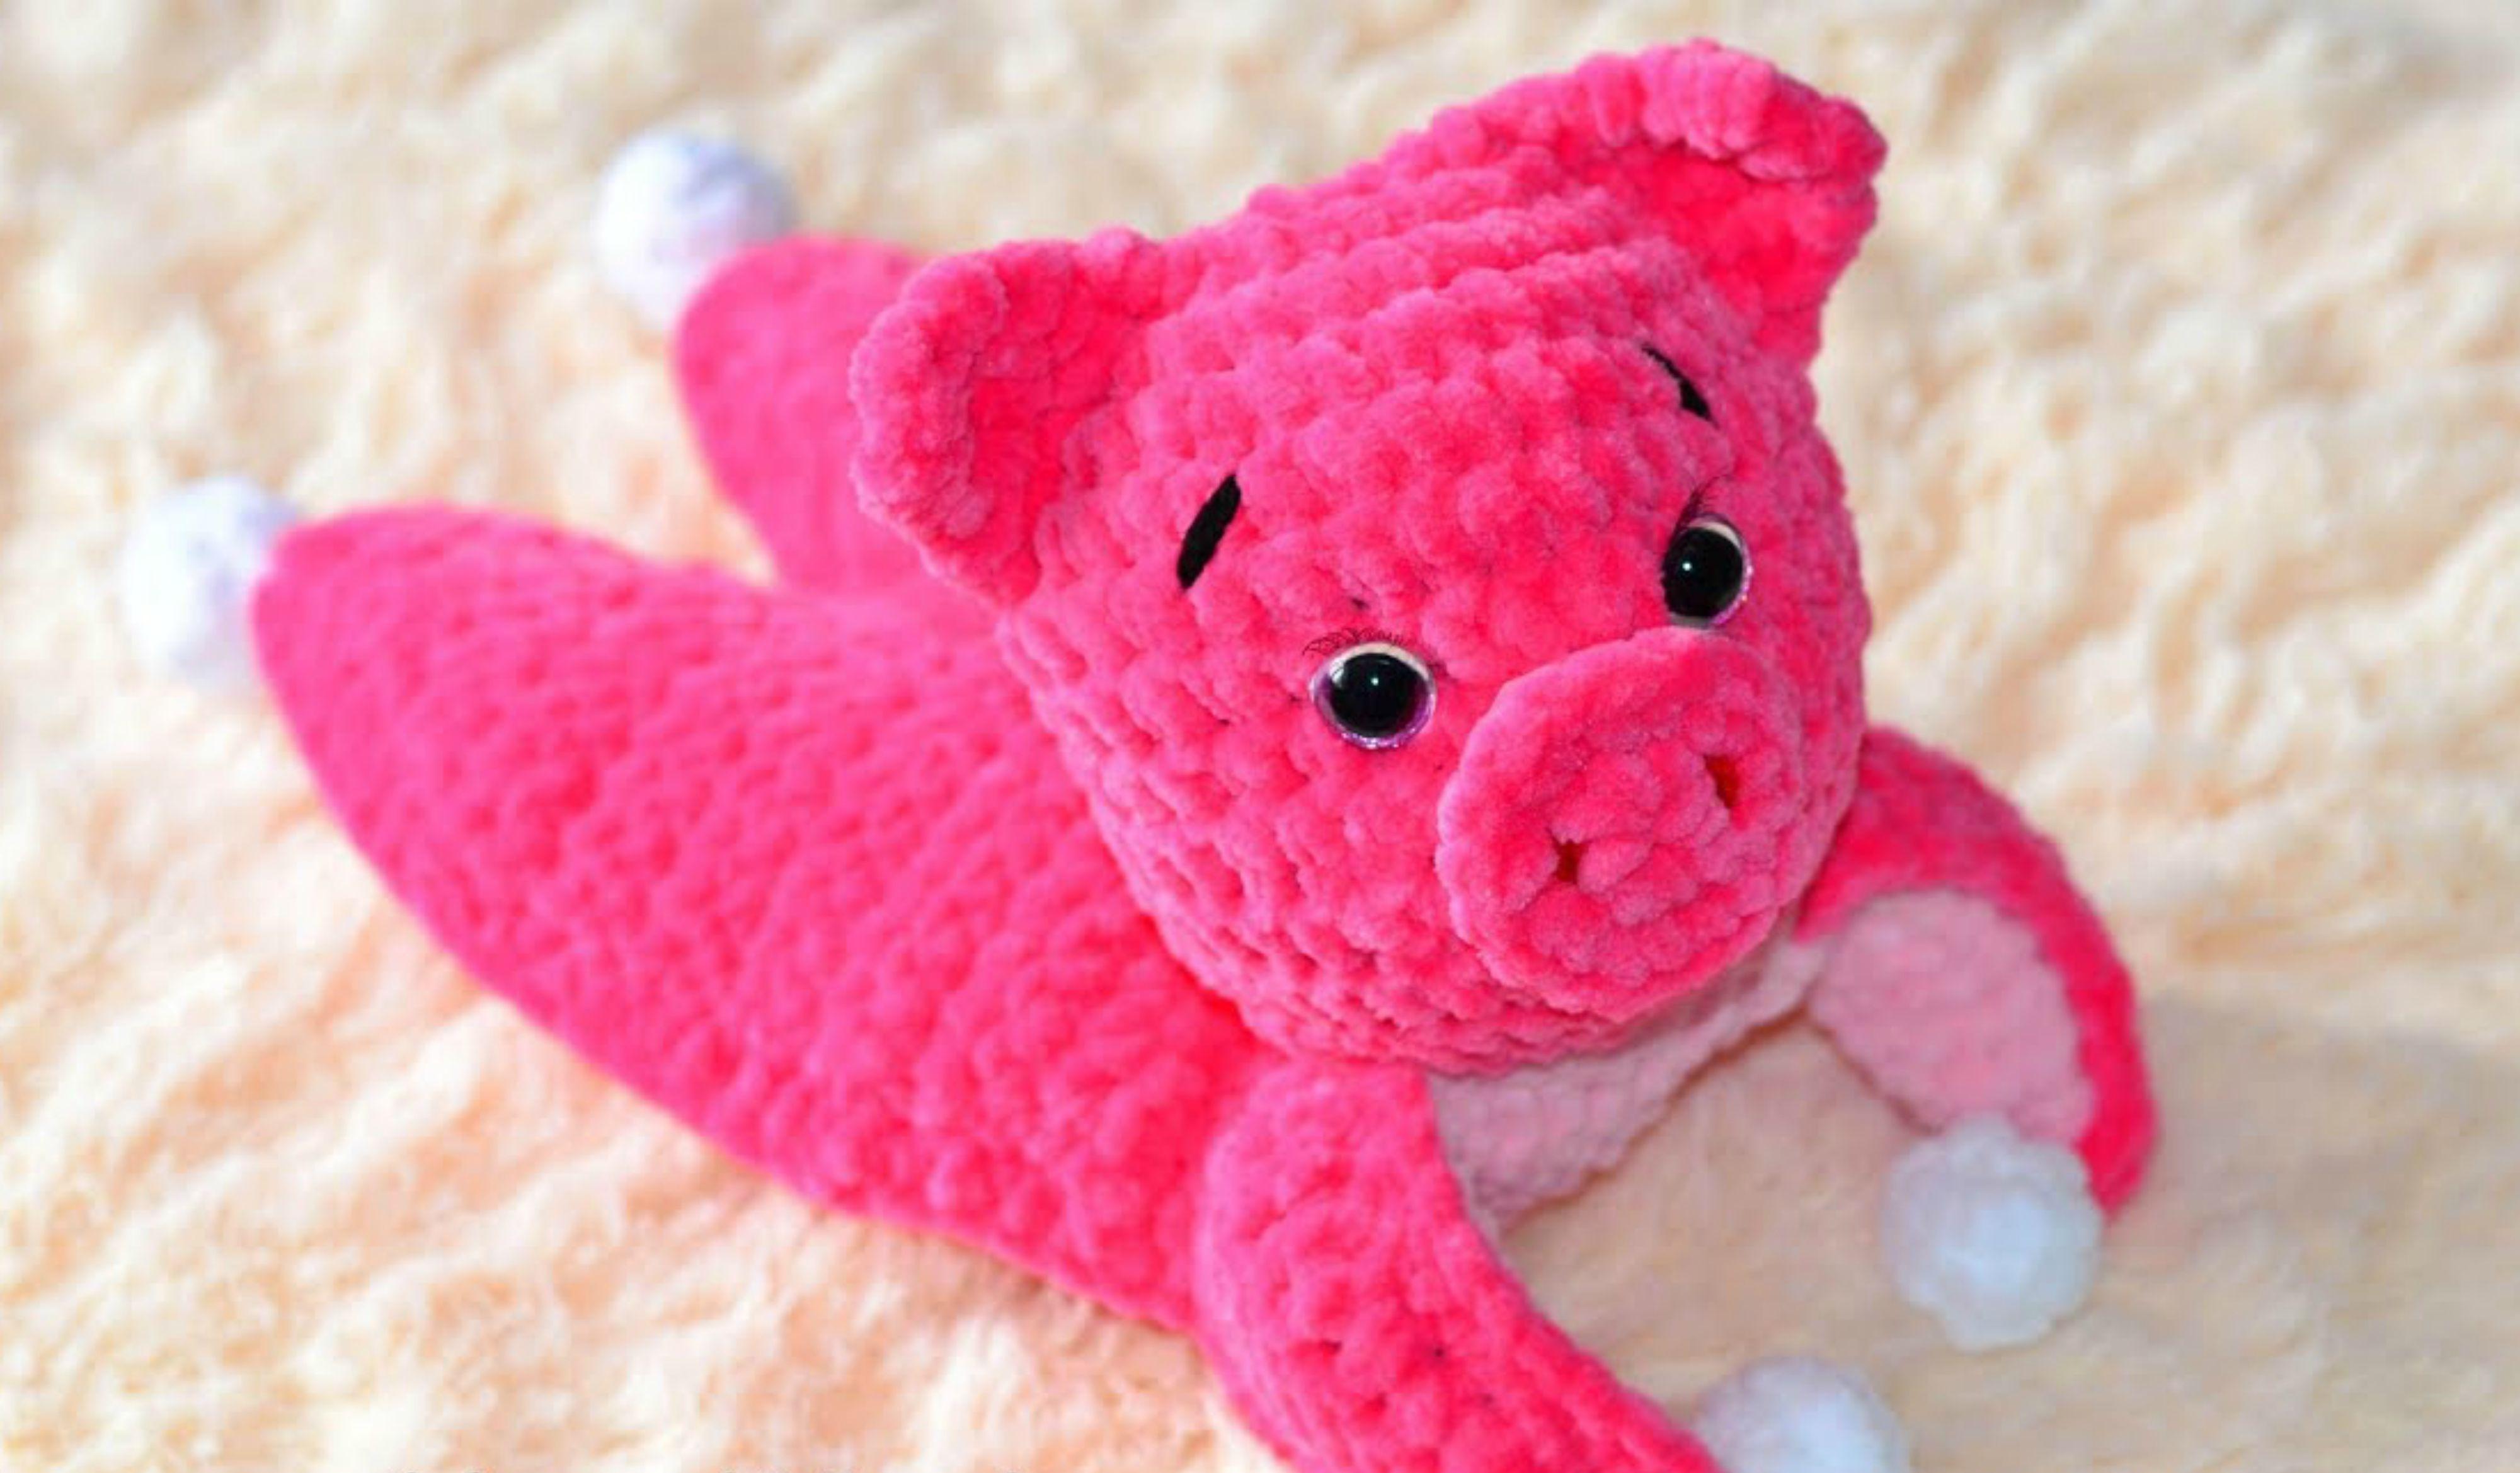 Crochet Pig Tutorial – Learn To Crochet